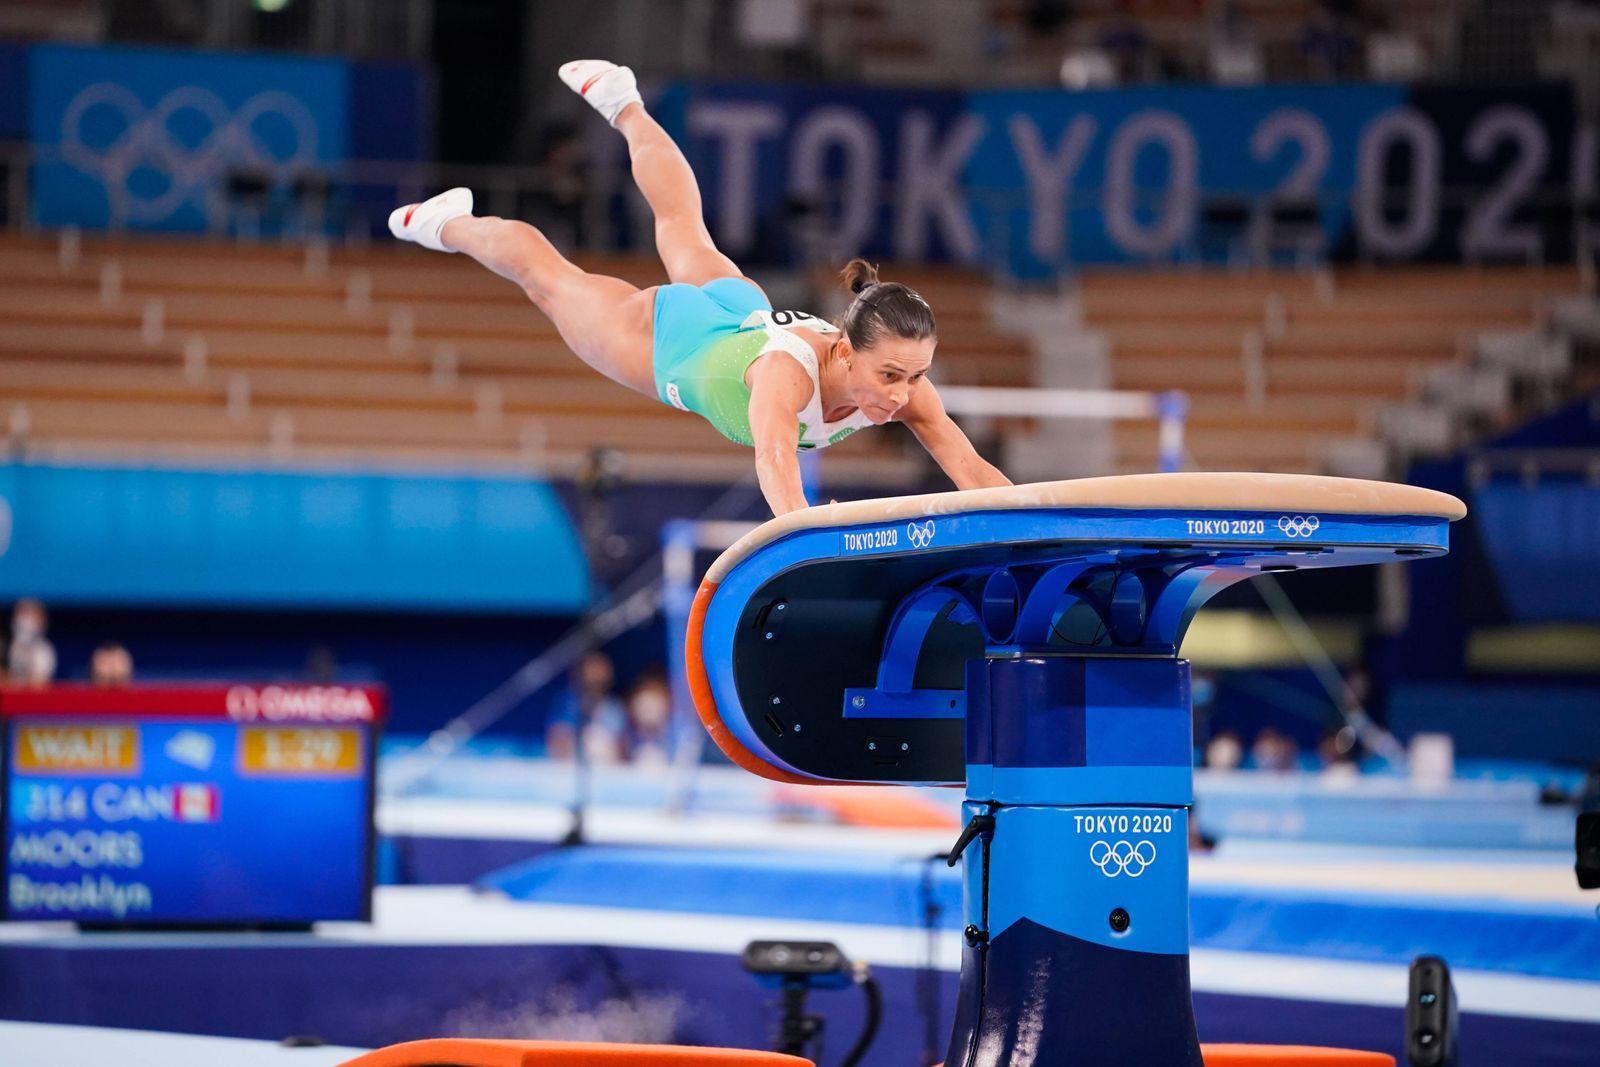 Oksana Chusovitina (UZB), JULY 25, 2021 - Gymnastics - Artistic : Women s Qualification during the Tokyo 2020 Olympic G